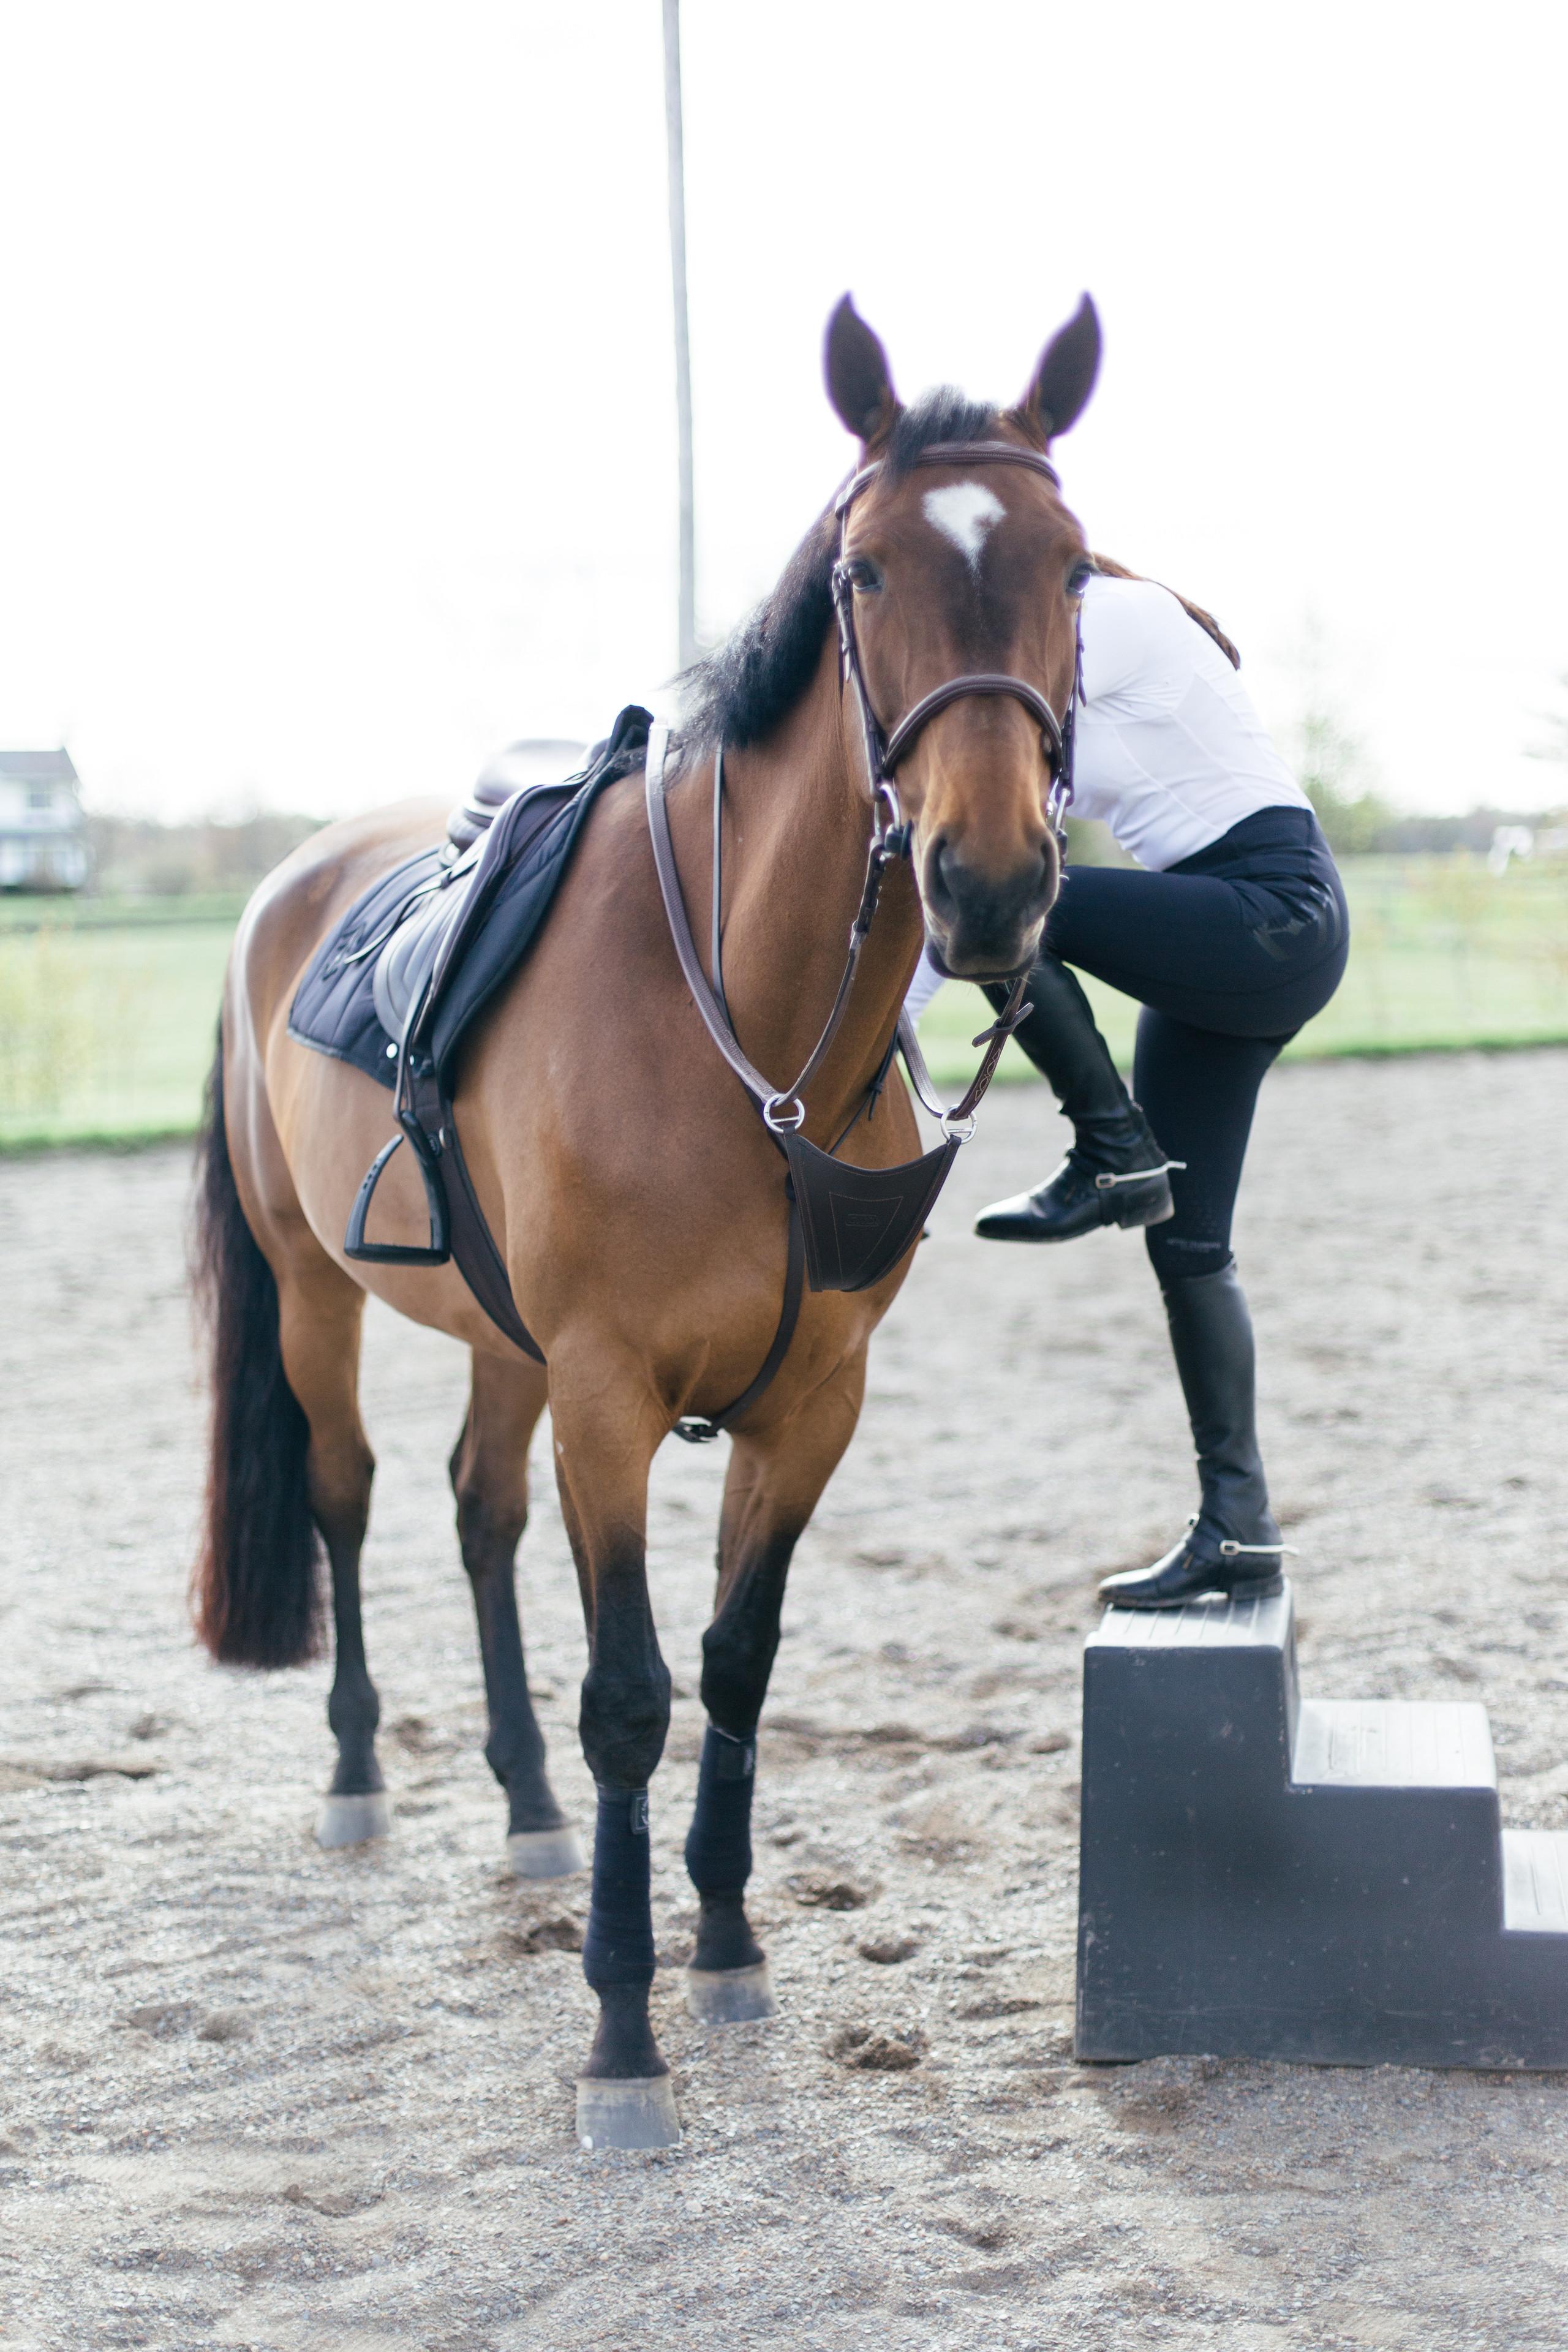 Aztec Diamond Equestrian, CWD Equestrian